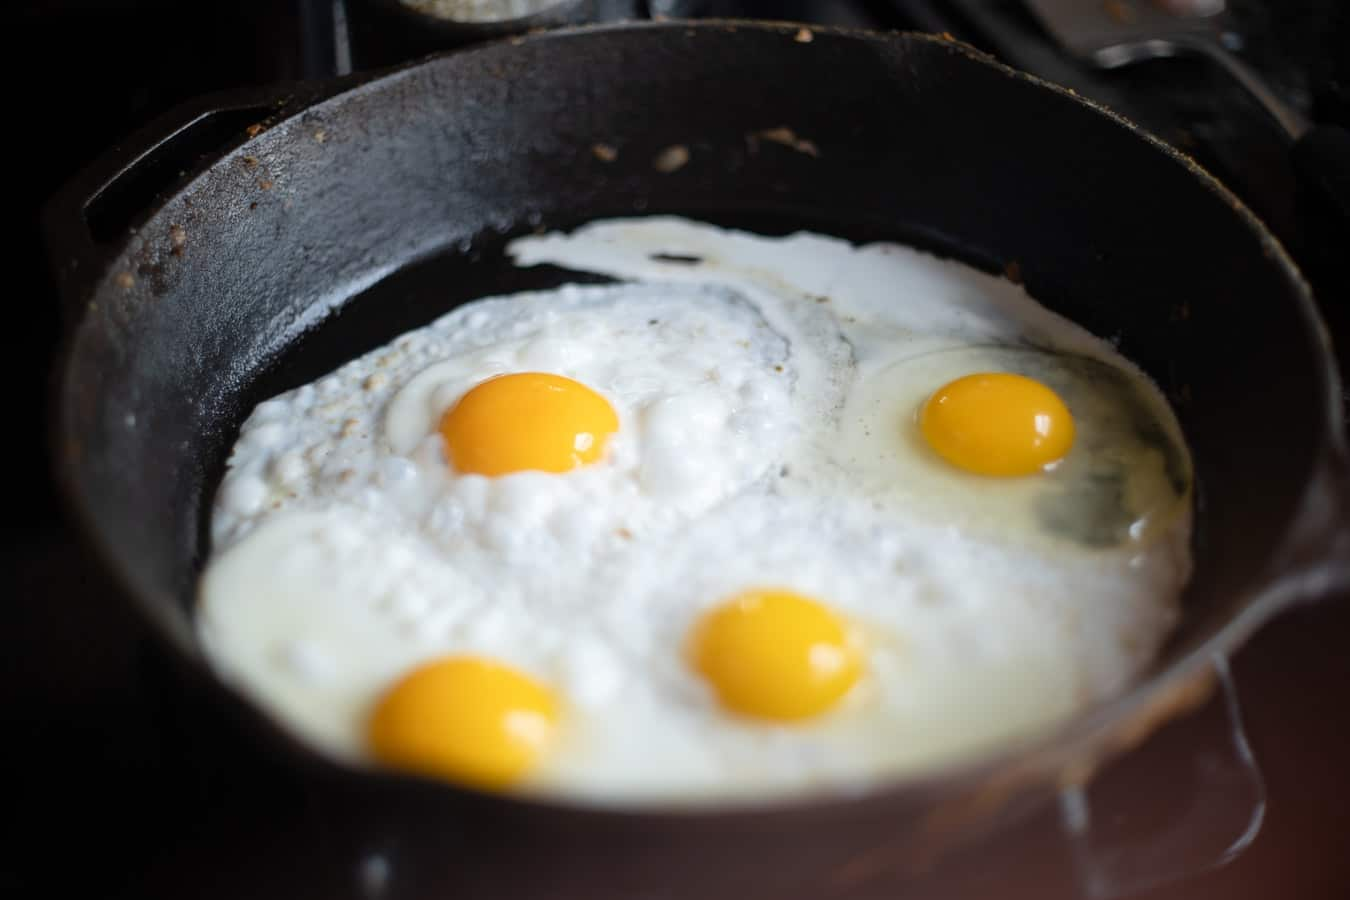 Milk and Egg Protein Sensitivities- a short summary